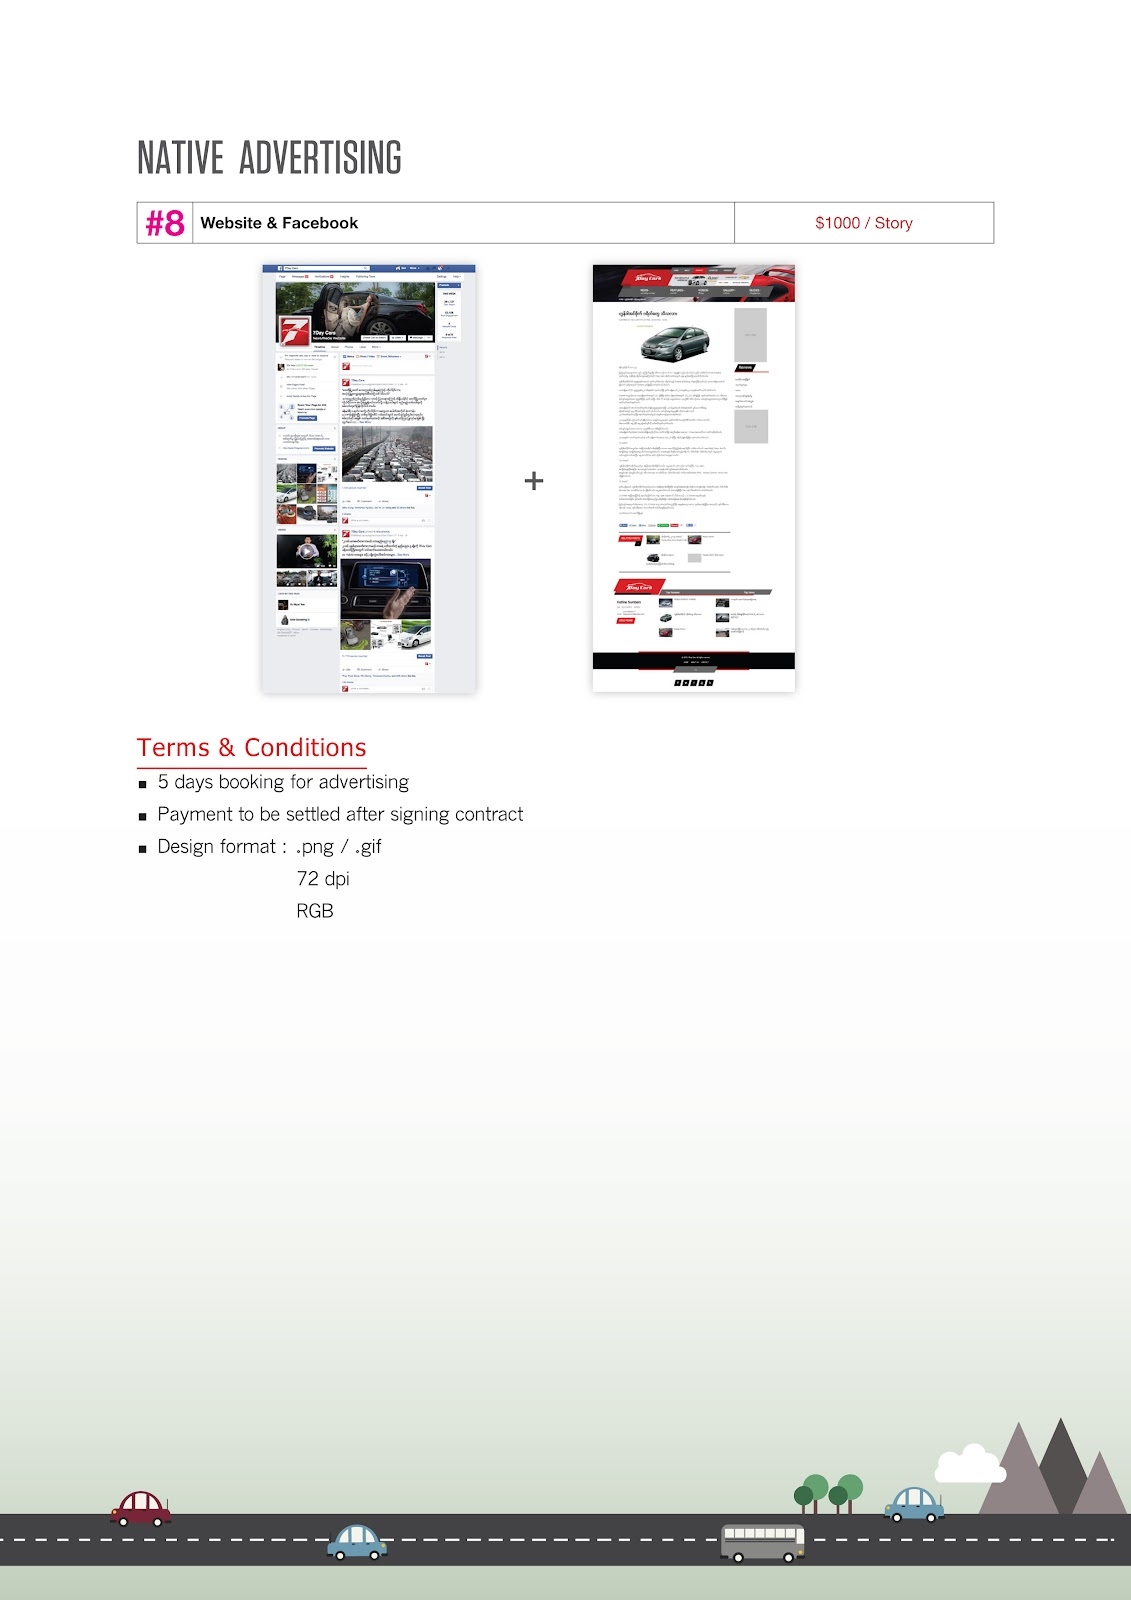 7DayCars-Ads-ratesheet-5.jpg